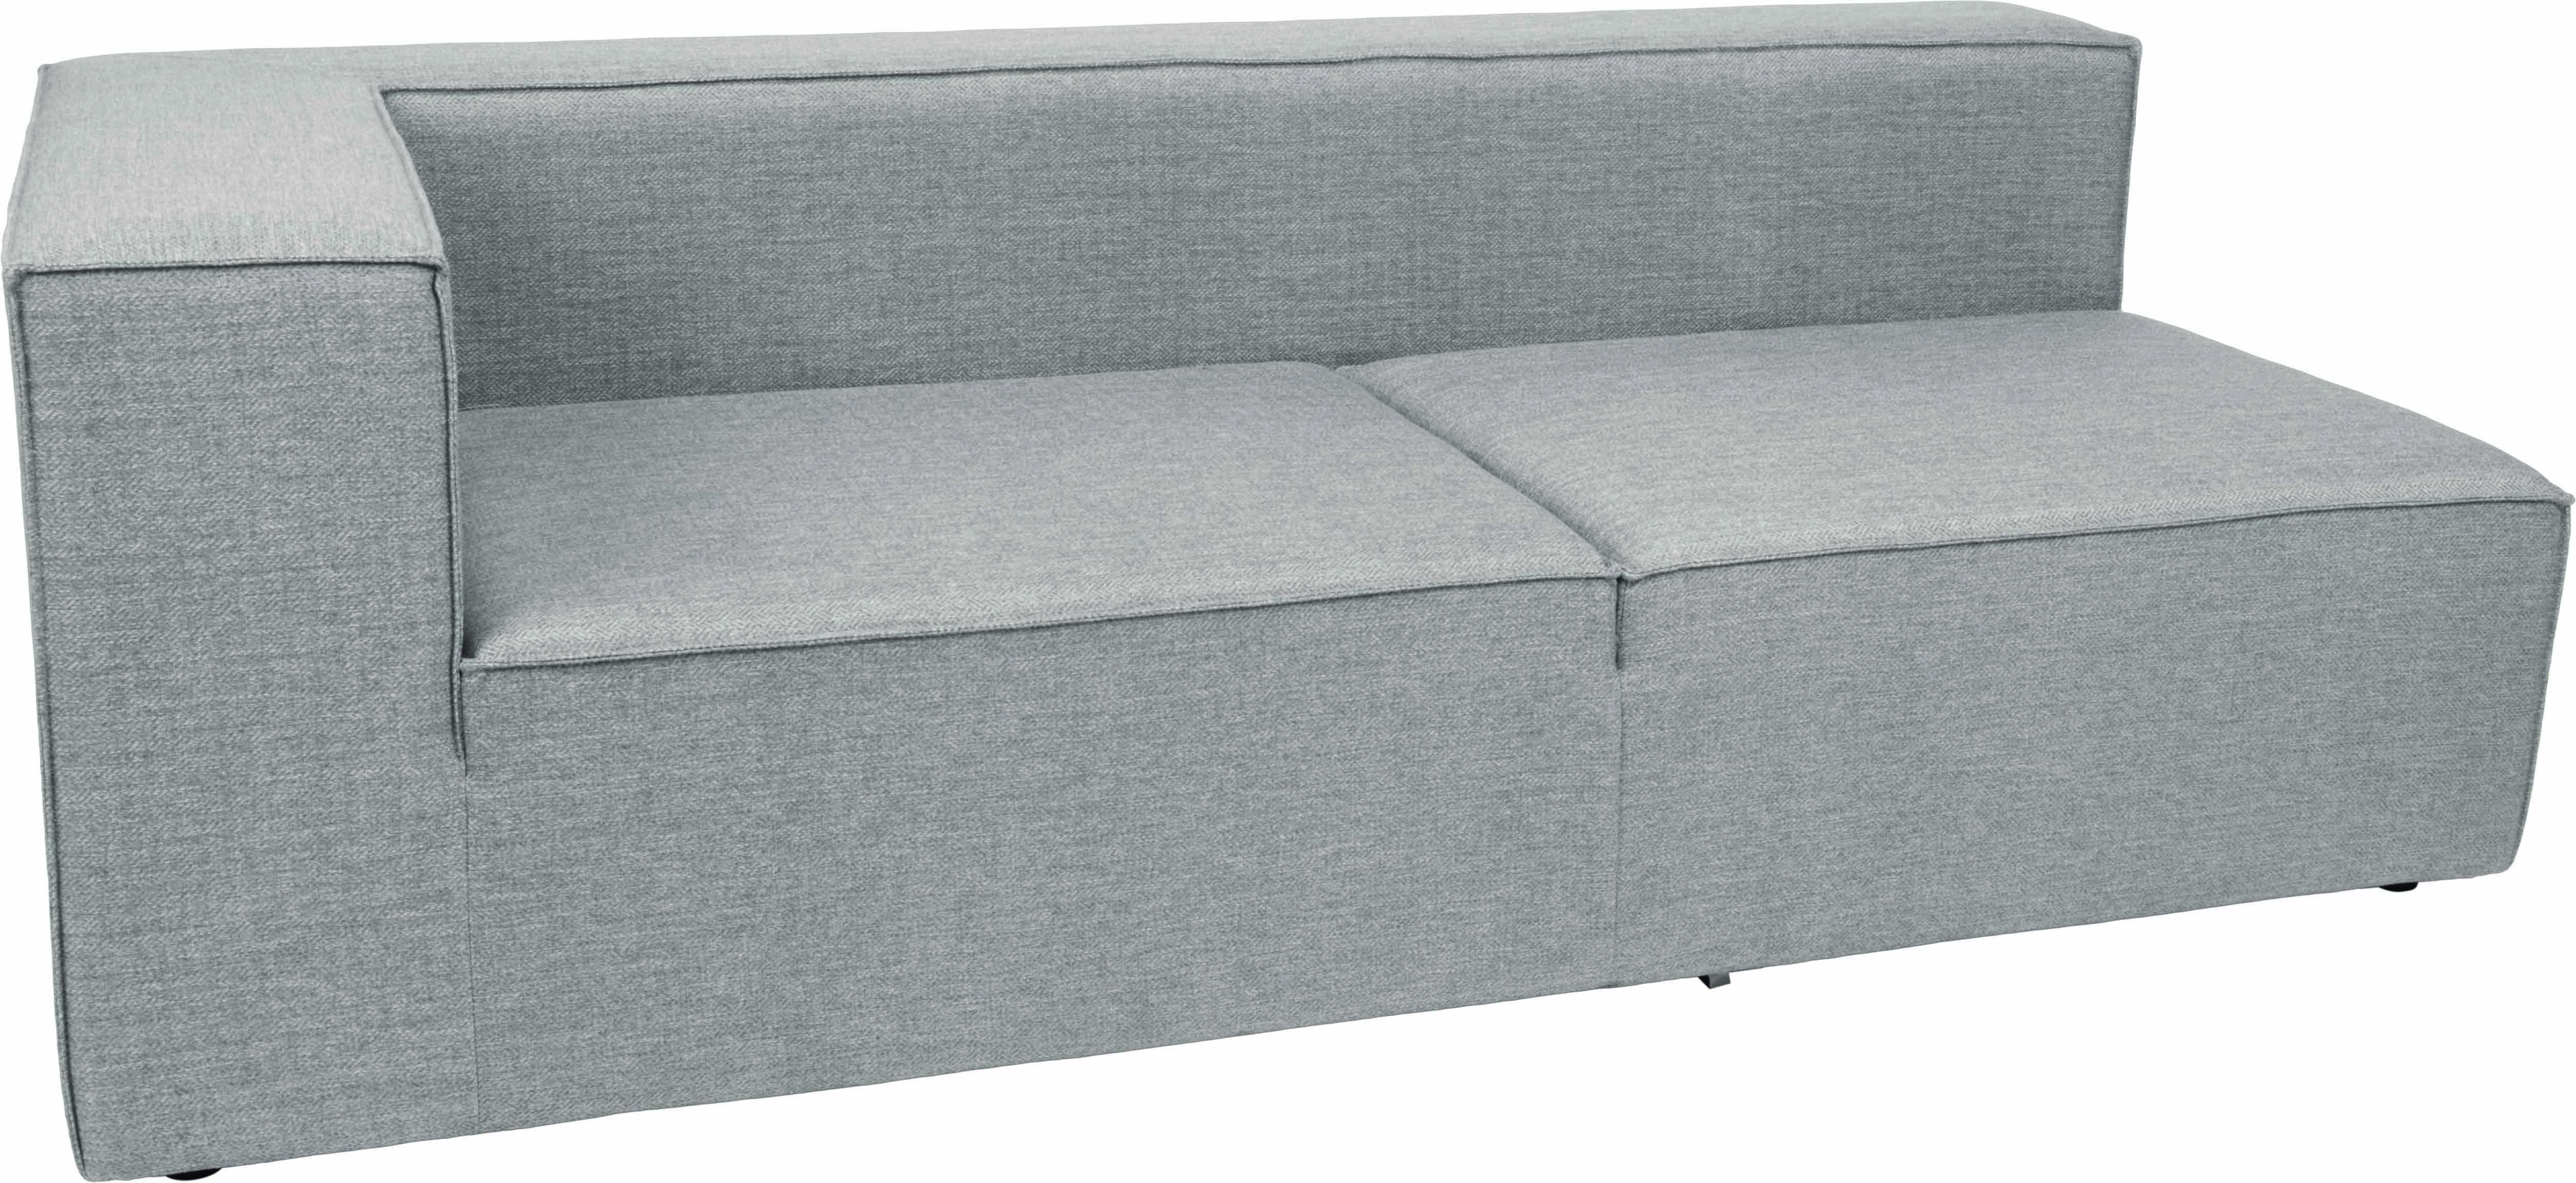 Charisma Sectional Sofa Luxury Sunbrella Outdoor Furniture Residential  Contract Pool Patio Modular Piece